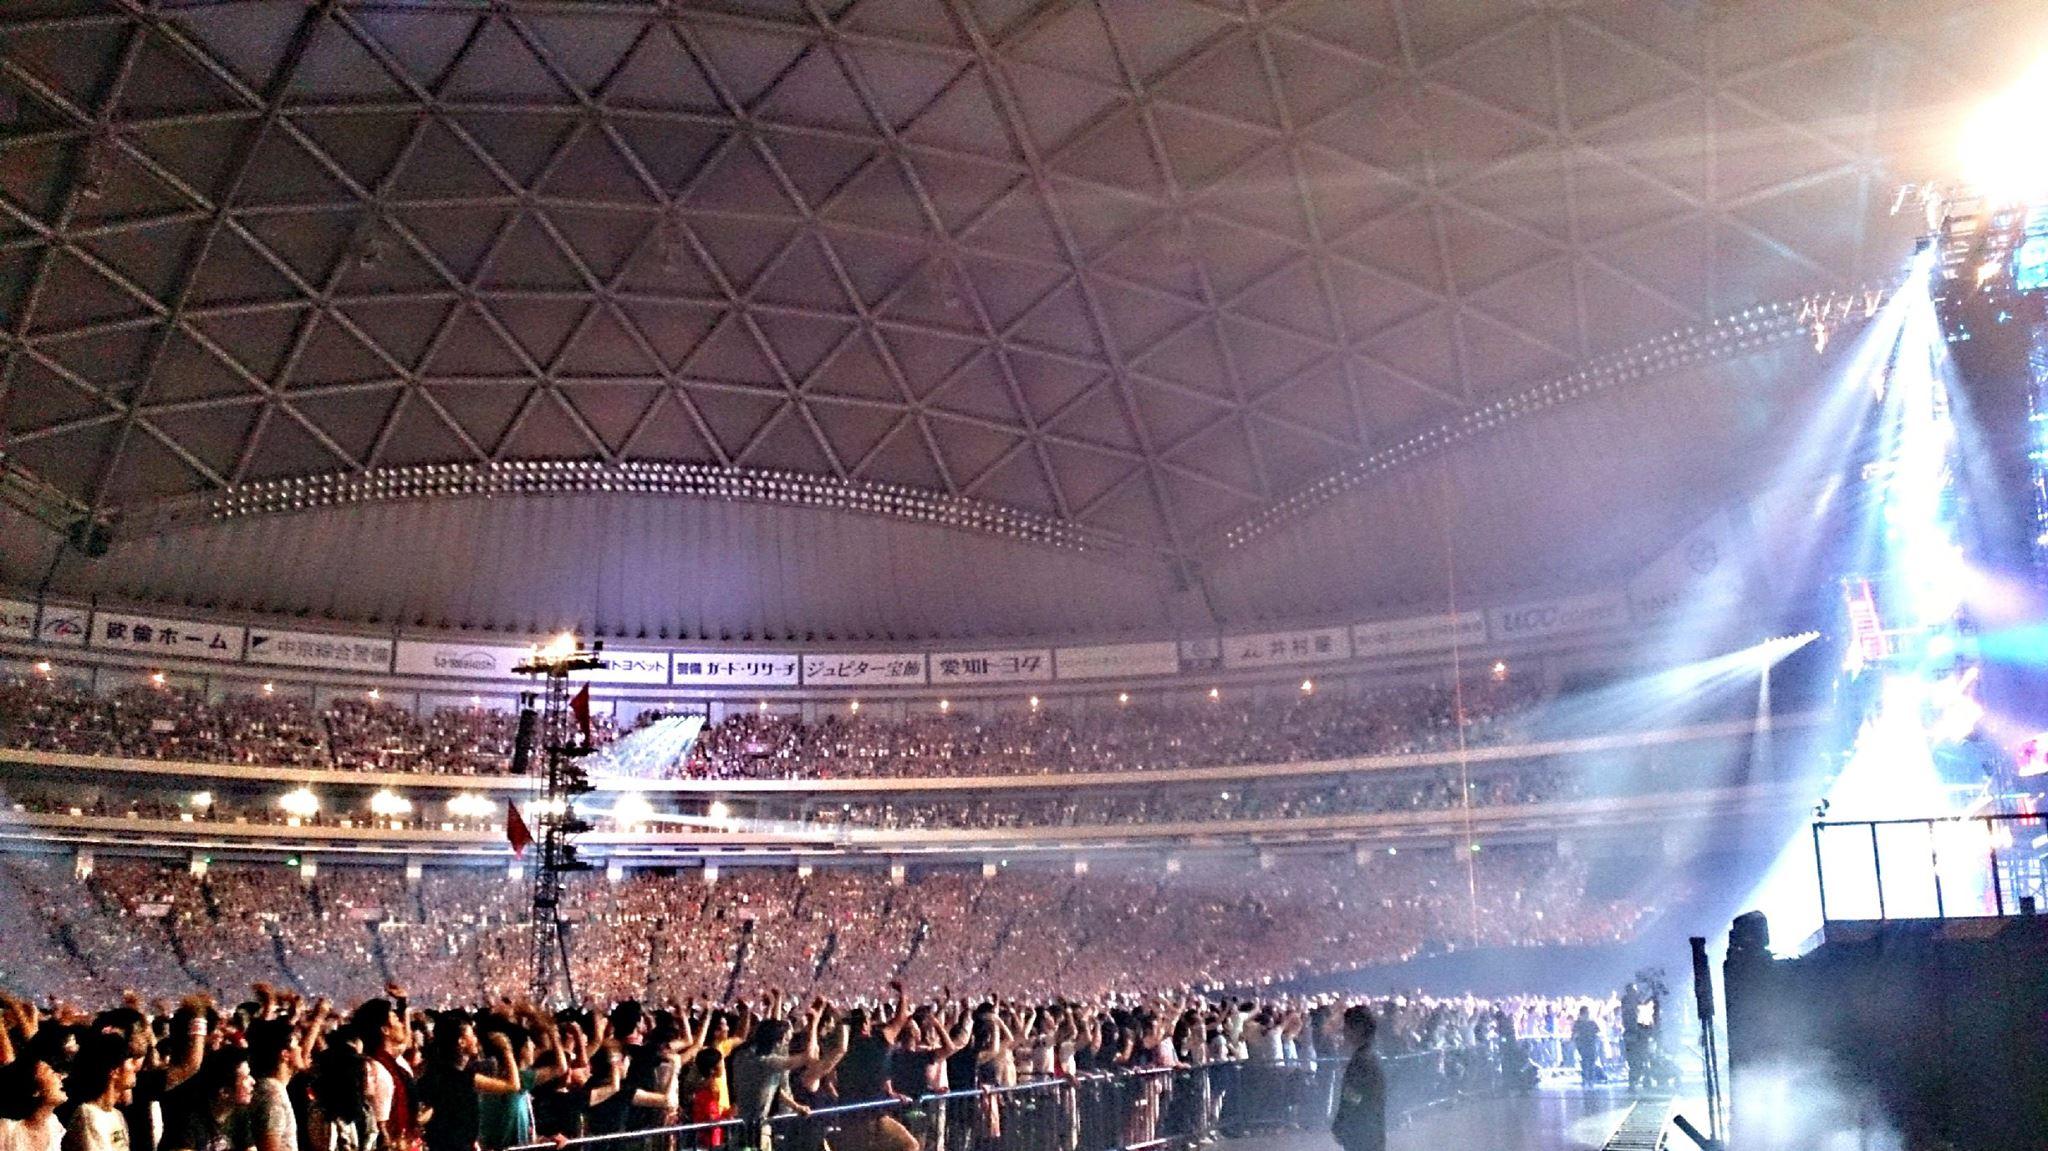 B'z LIVE-GYM 2015 -EPIC NIGHT- ナゴヤドーム初日SNS情報まとめ!!